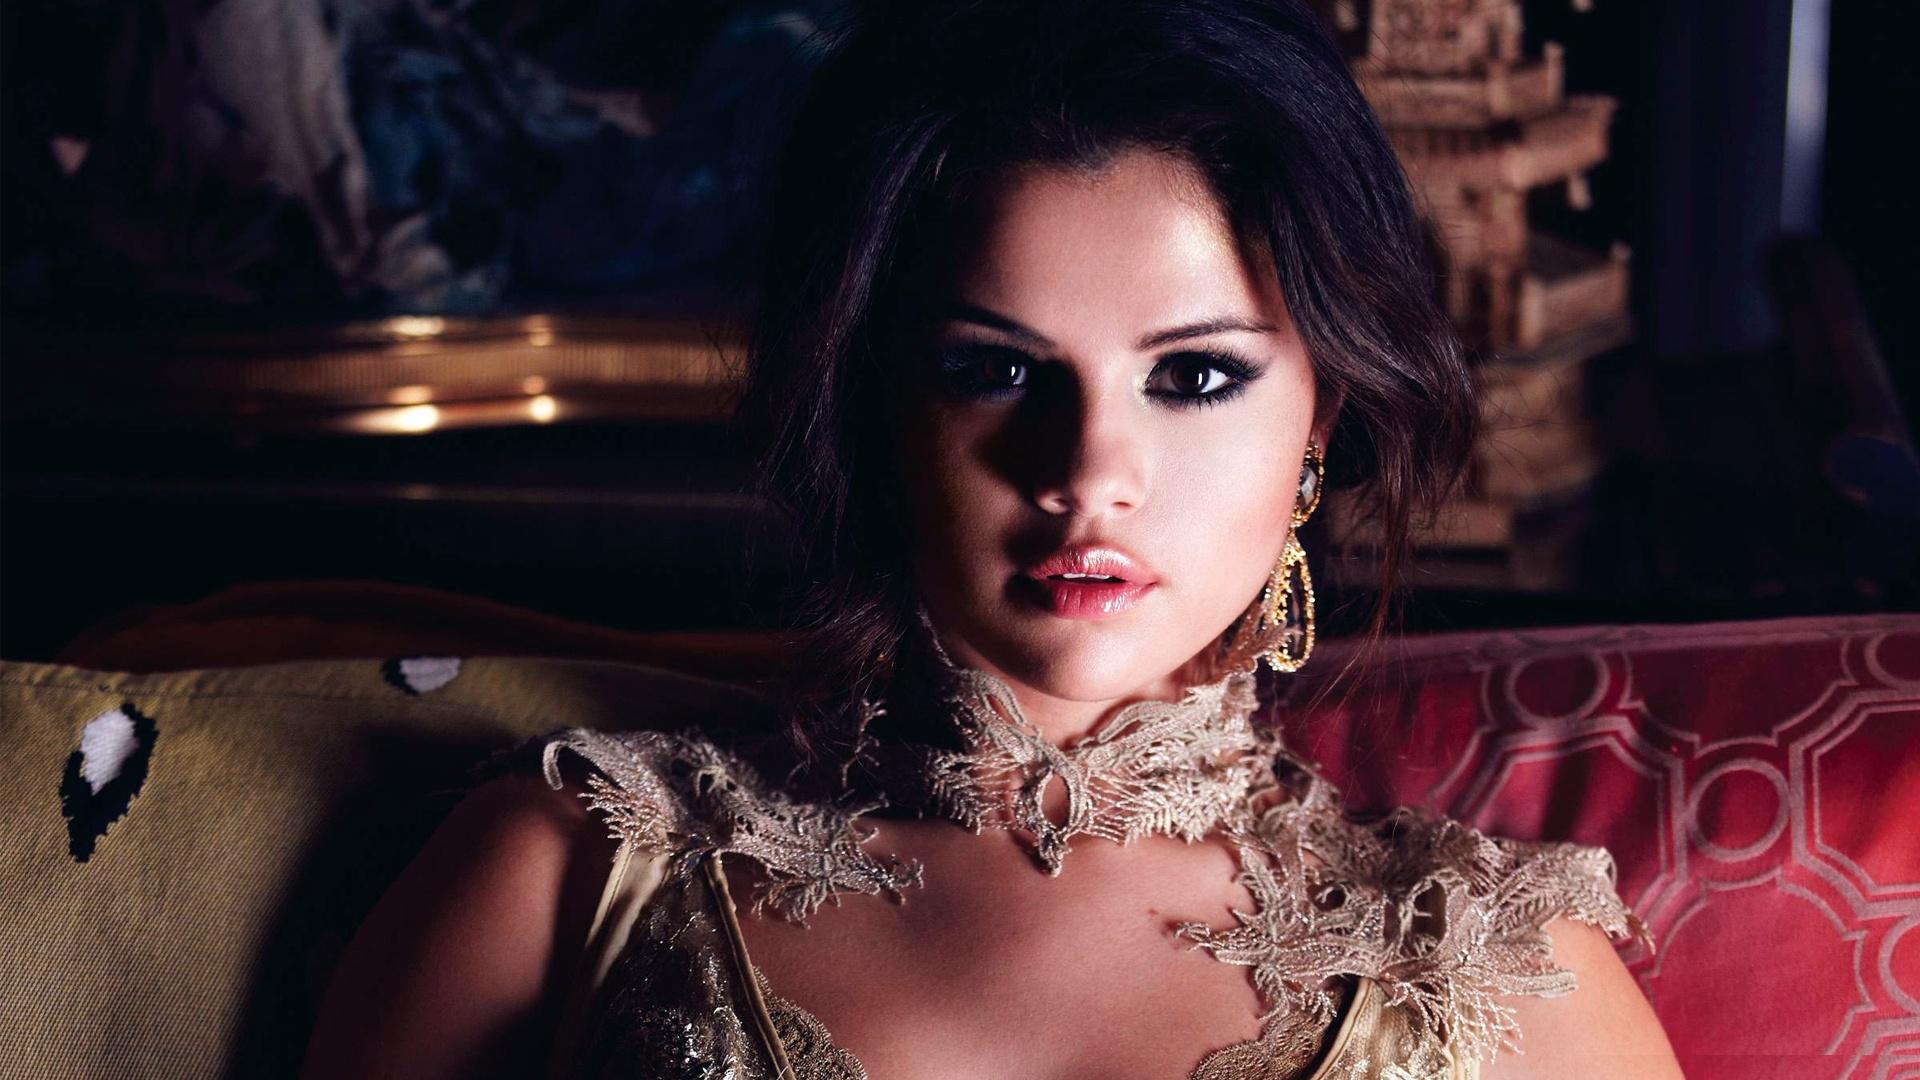 Selena Gomez Wallpapers1